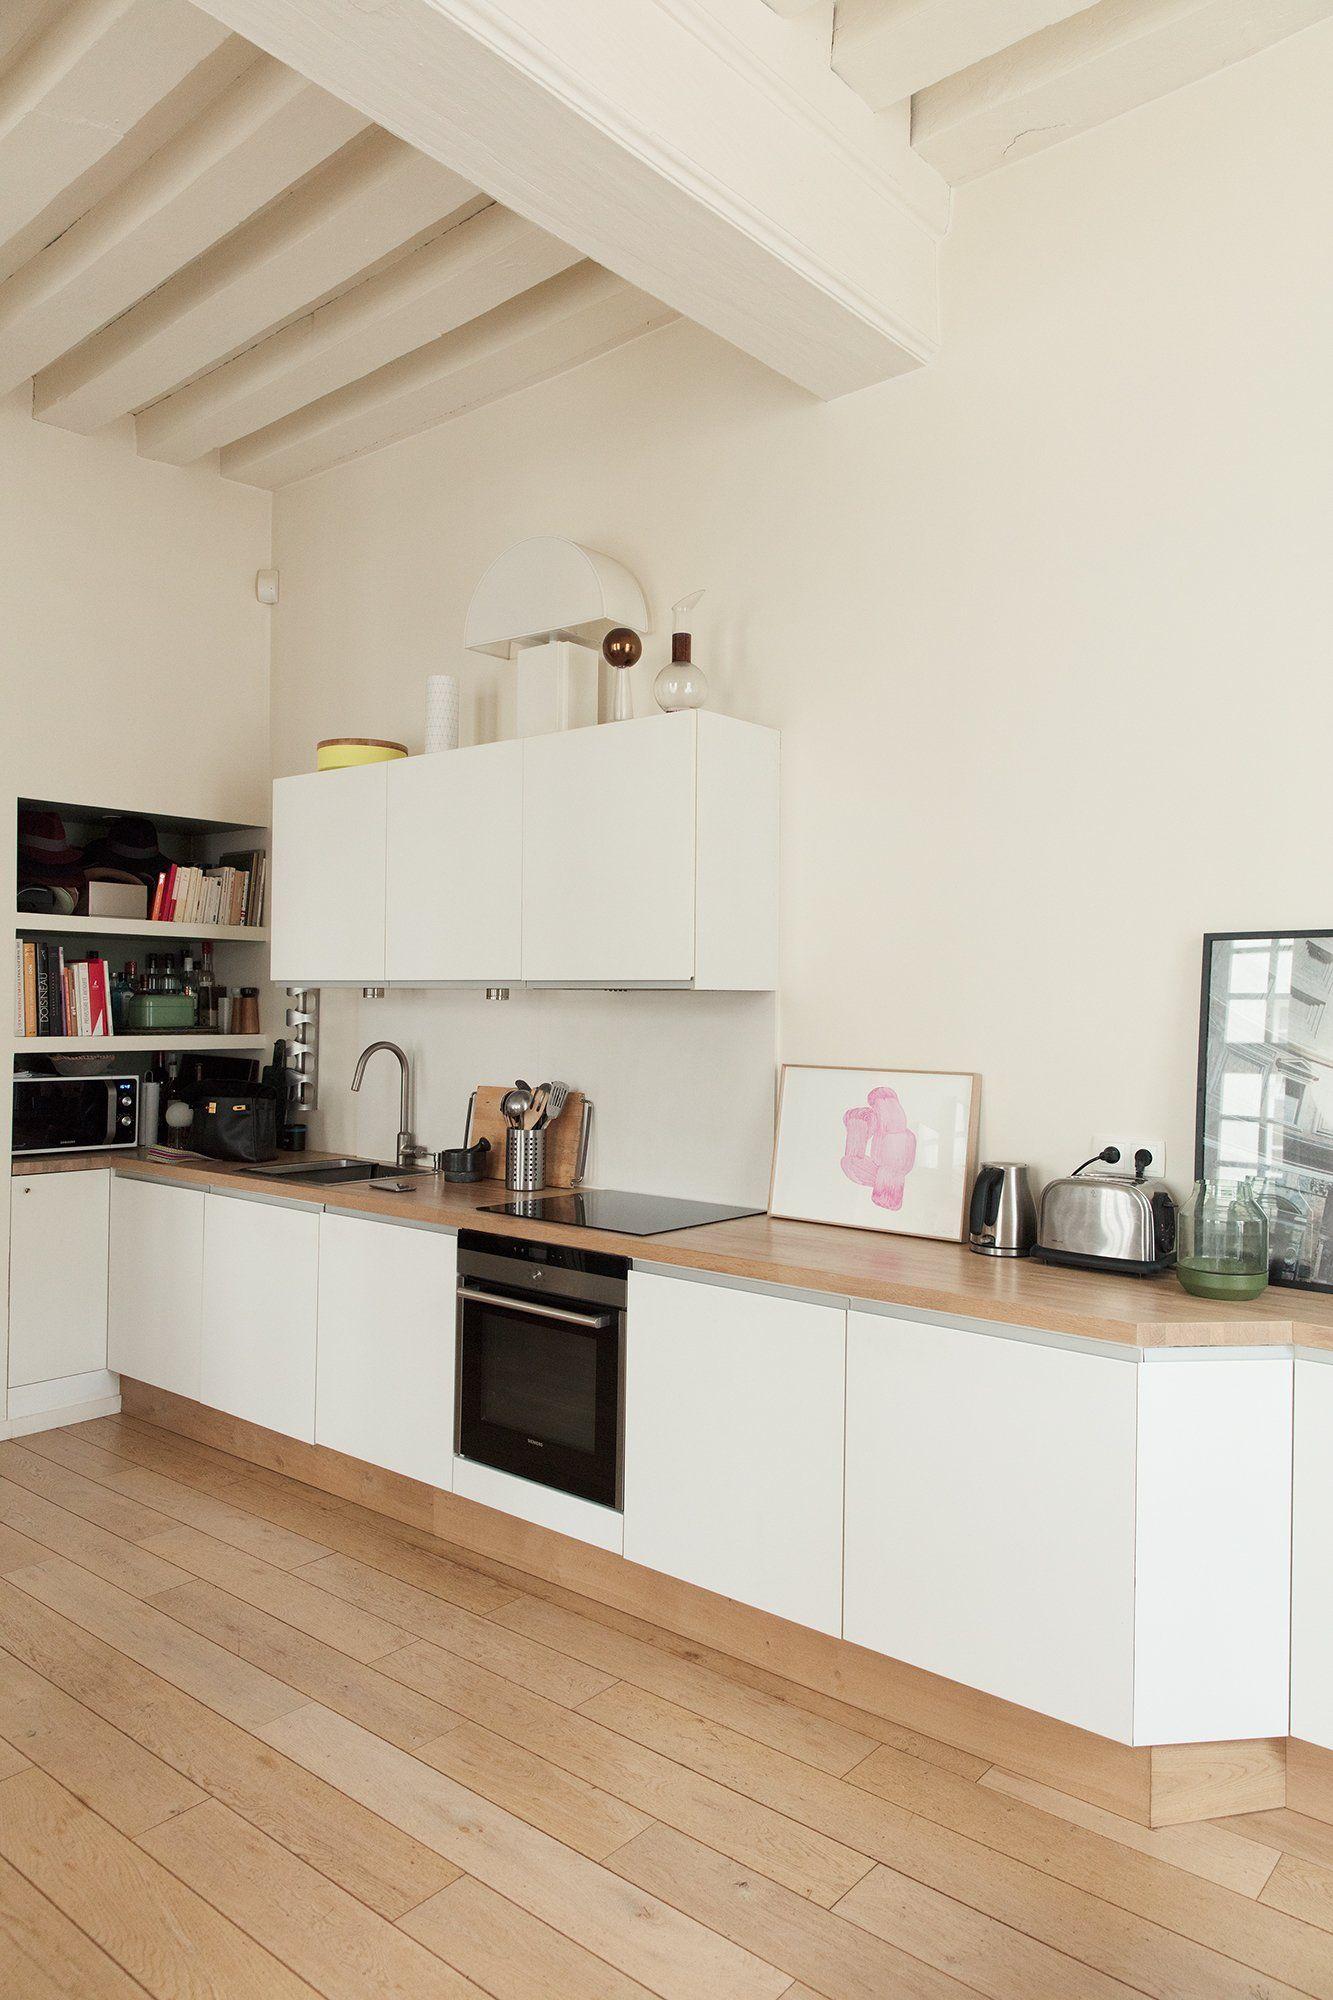 William Ventura, architecte global | Architects, Woods and Kitchens